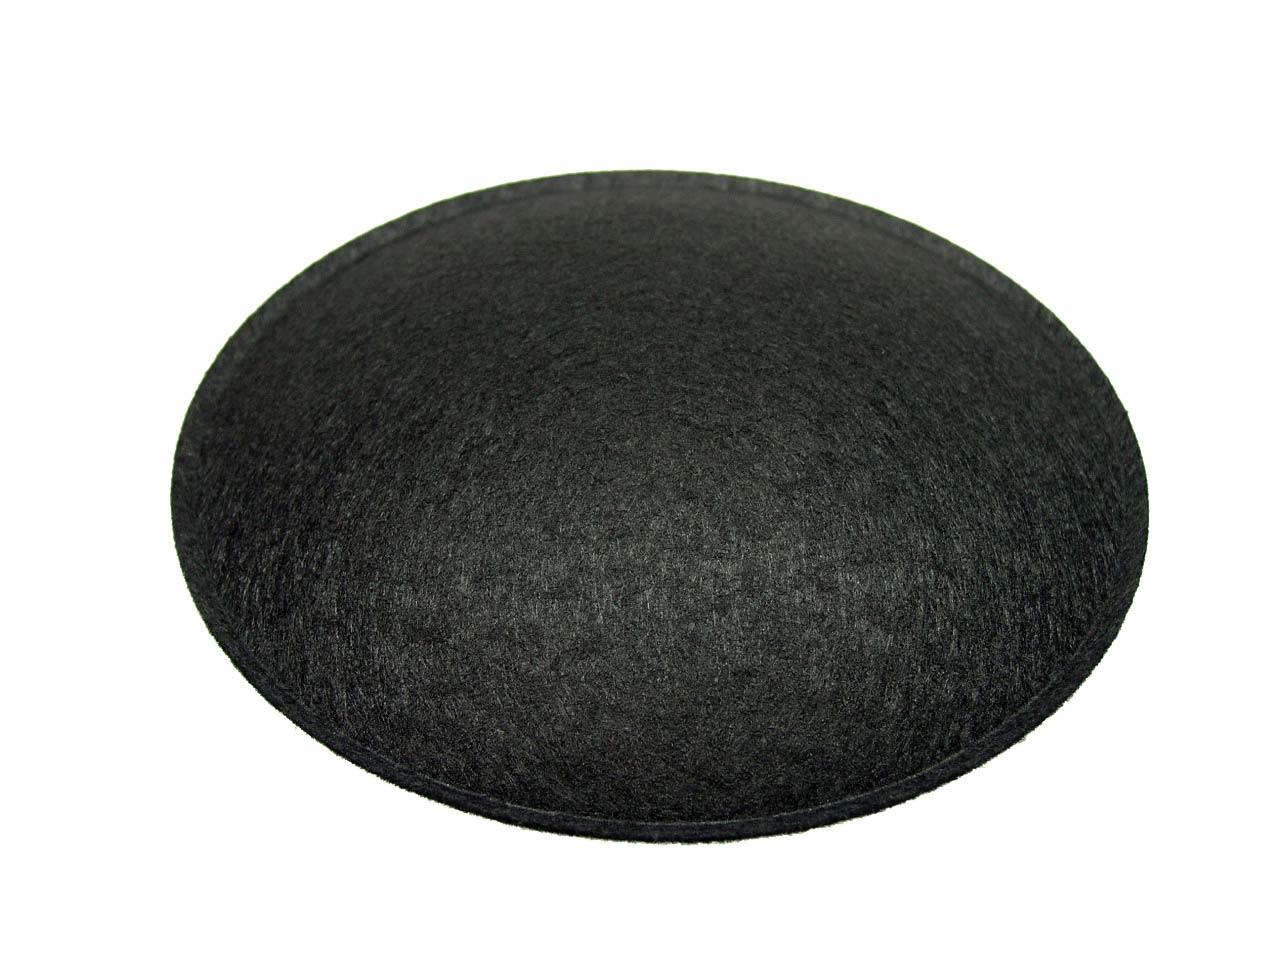 4 5 speaker dust cap black felt with lip dc 4 5f. Black Bedroom Furniture Sets. Home Design Ideas